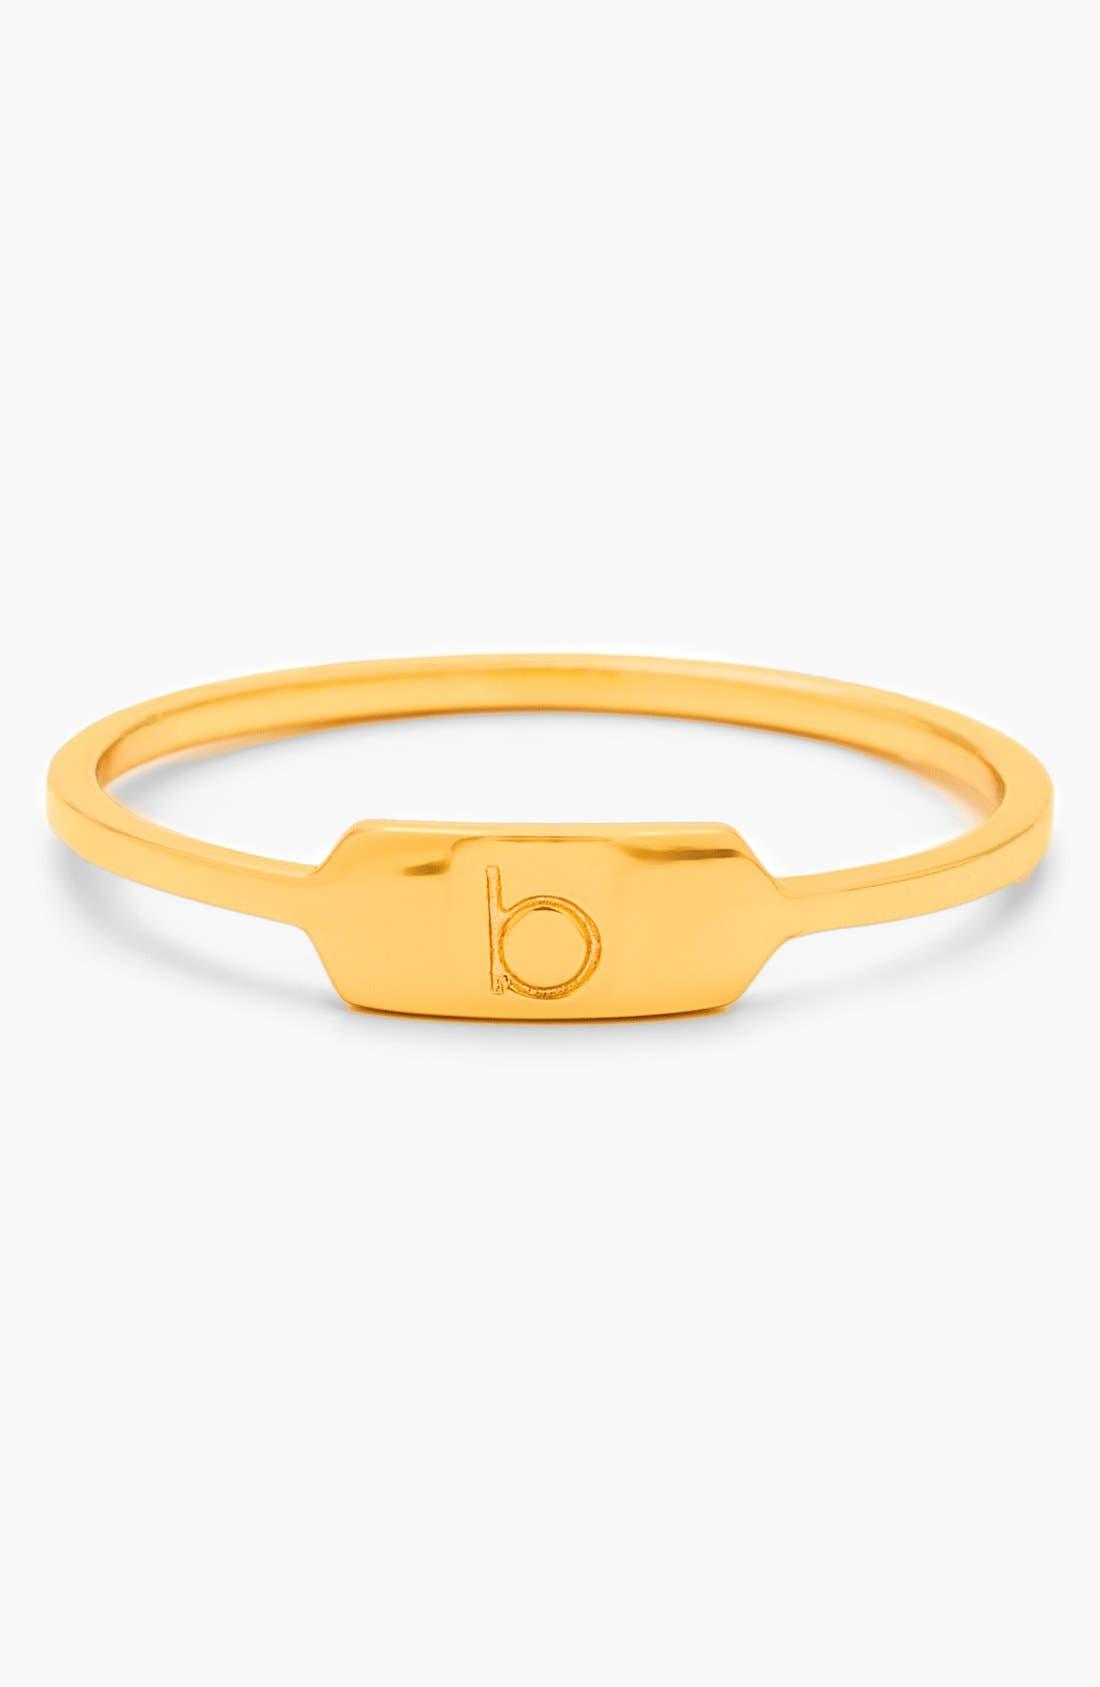 Main Image - gorjana 'Letterpress' Initial Ring